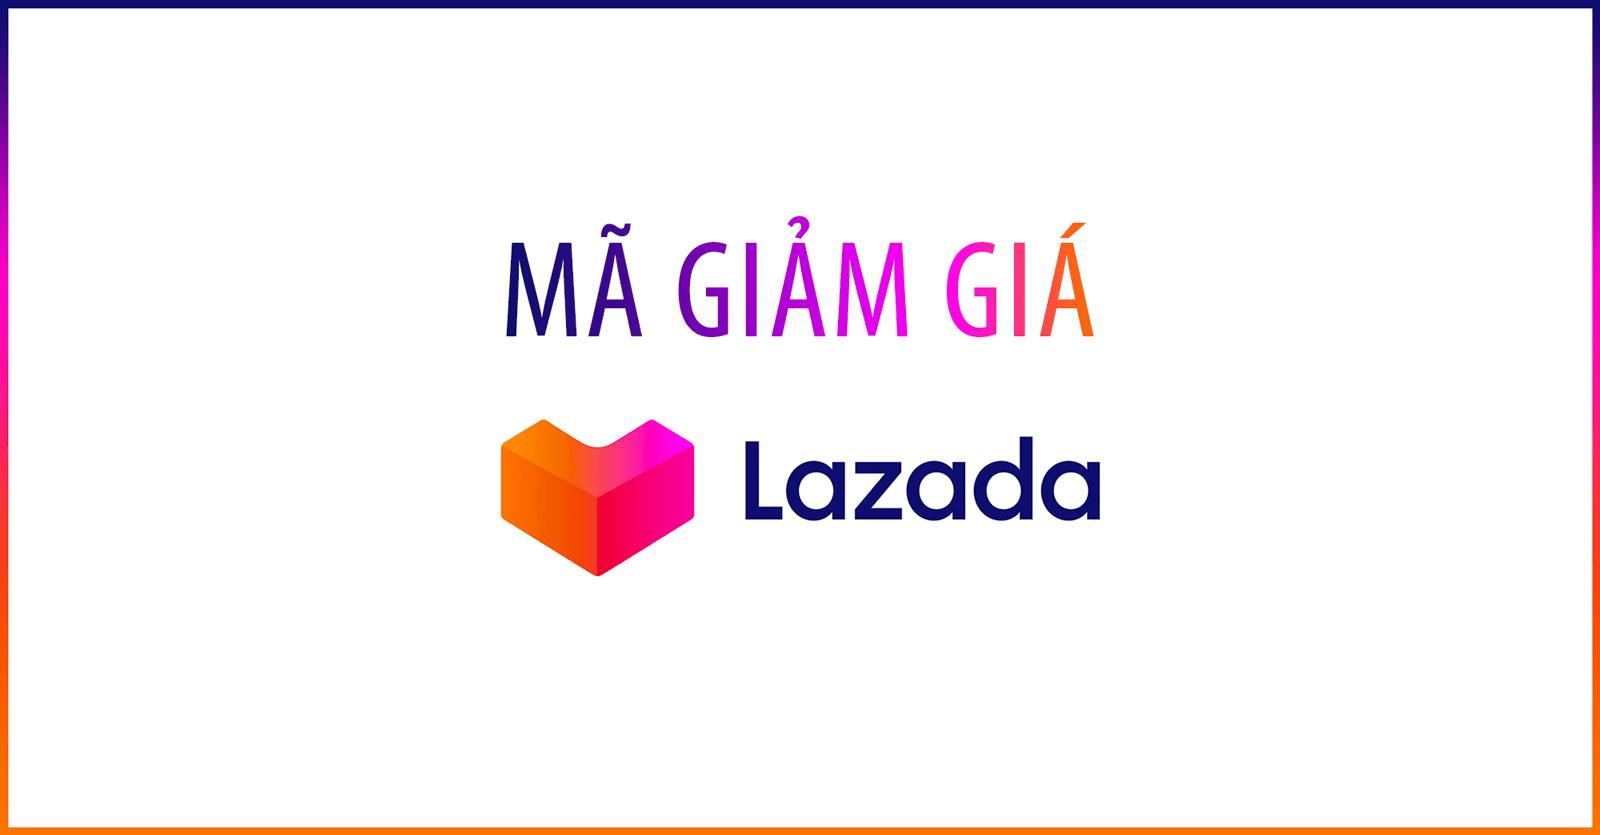 ma-giam-gia-lazada-la-gi.png